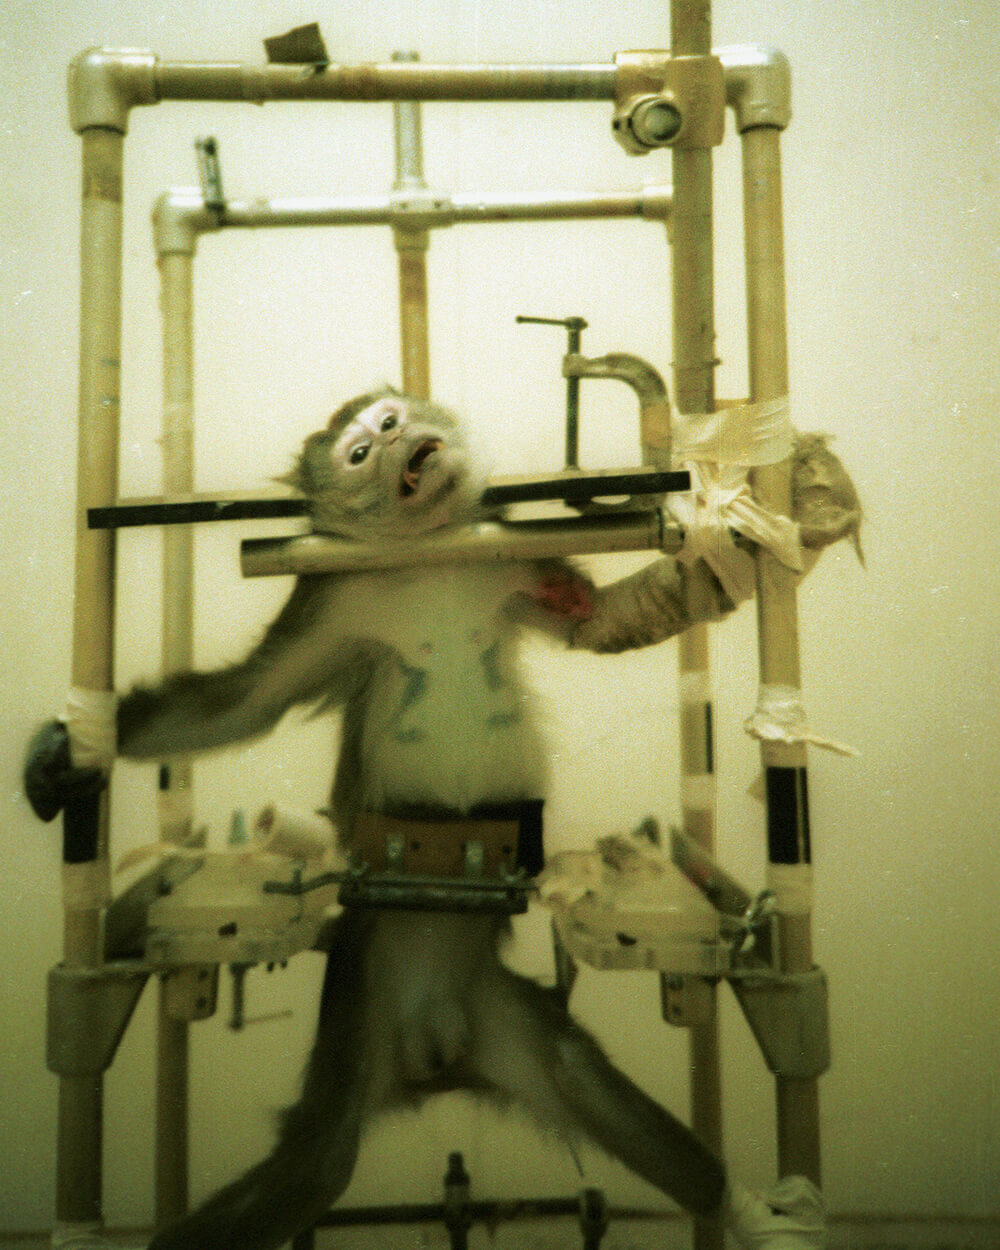 AirFrance monkey in restraints-14